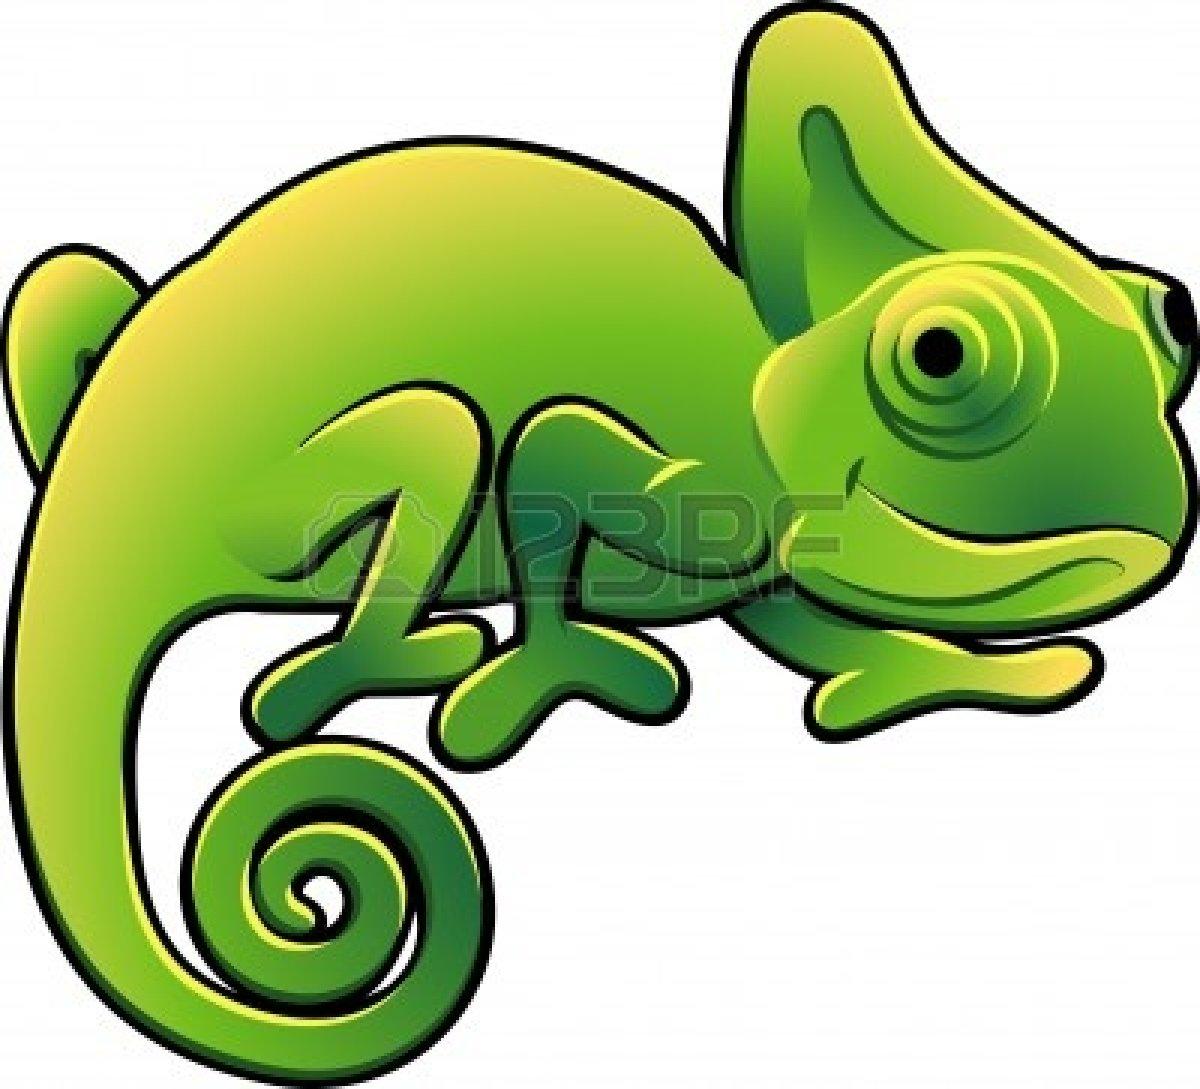 Cute lizard images wikiclipart. Free clipart iguana